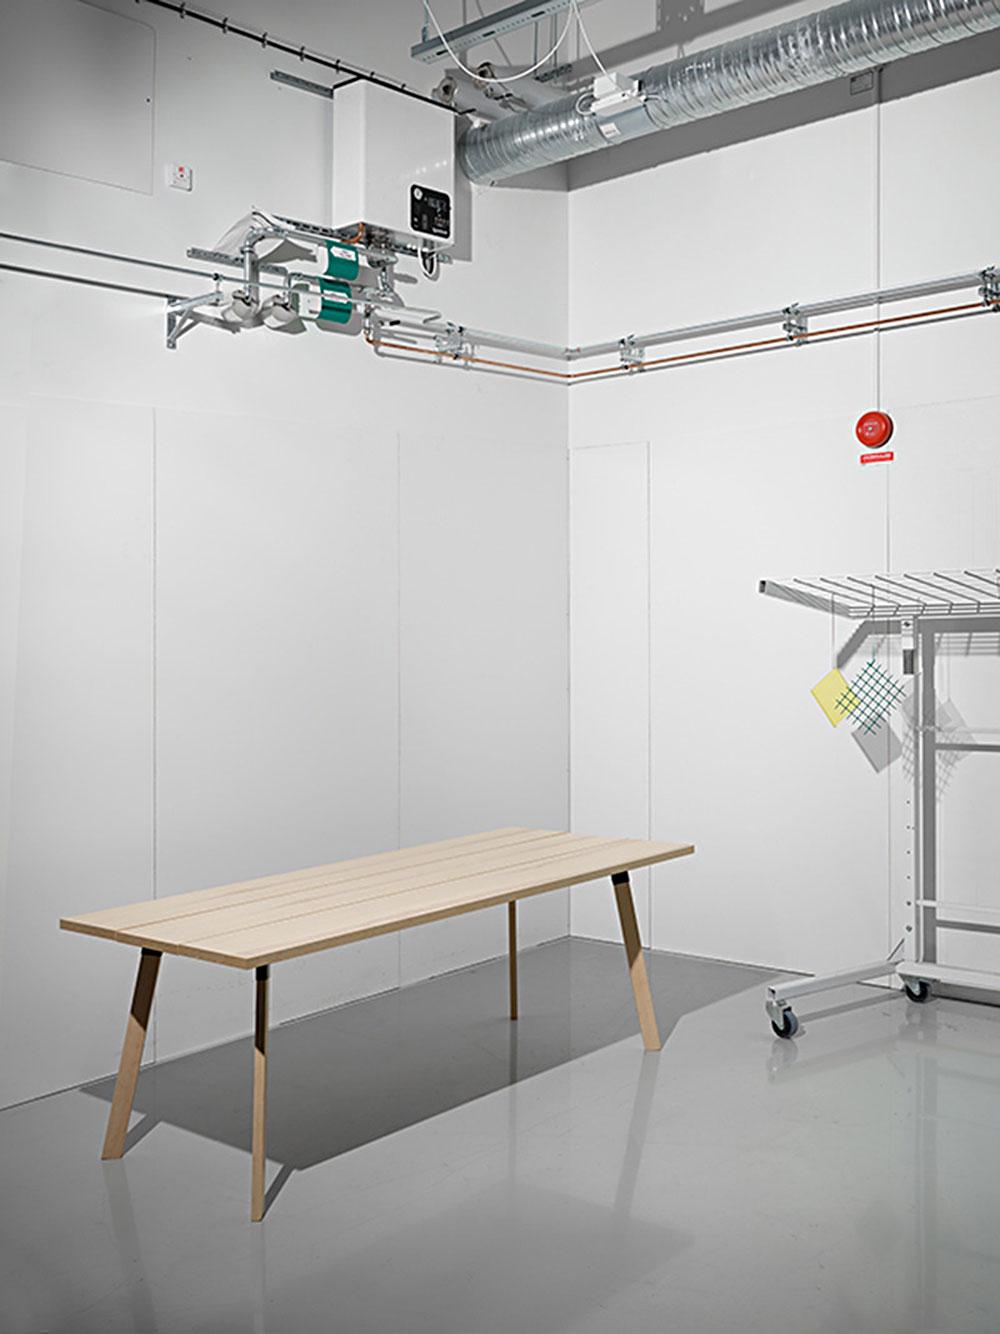 Ikea-Hay-Collaboration-2017-Design-3